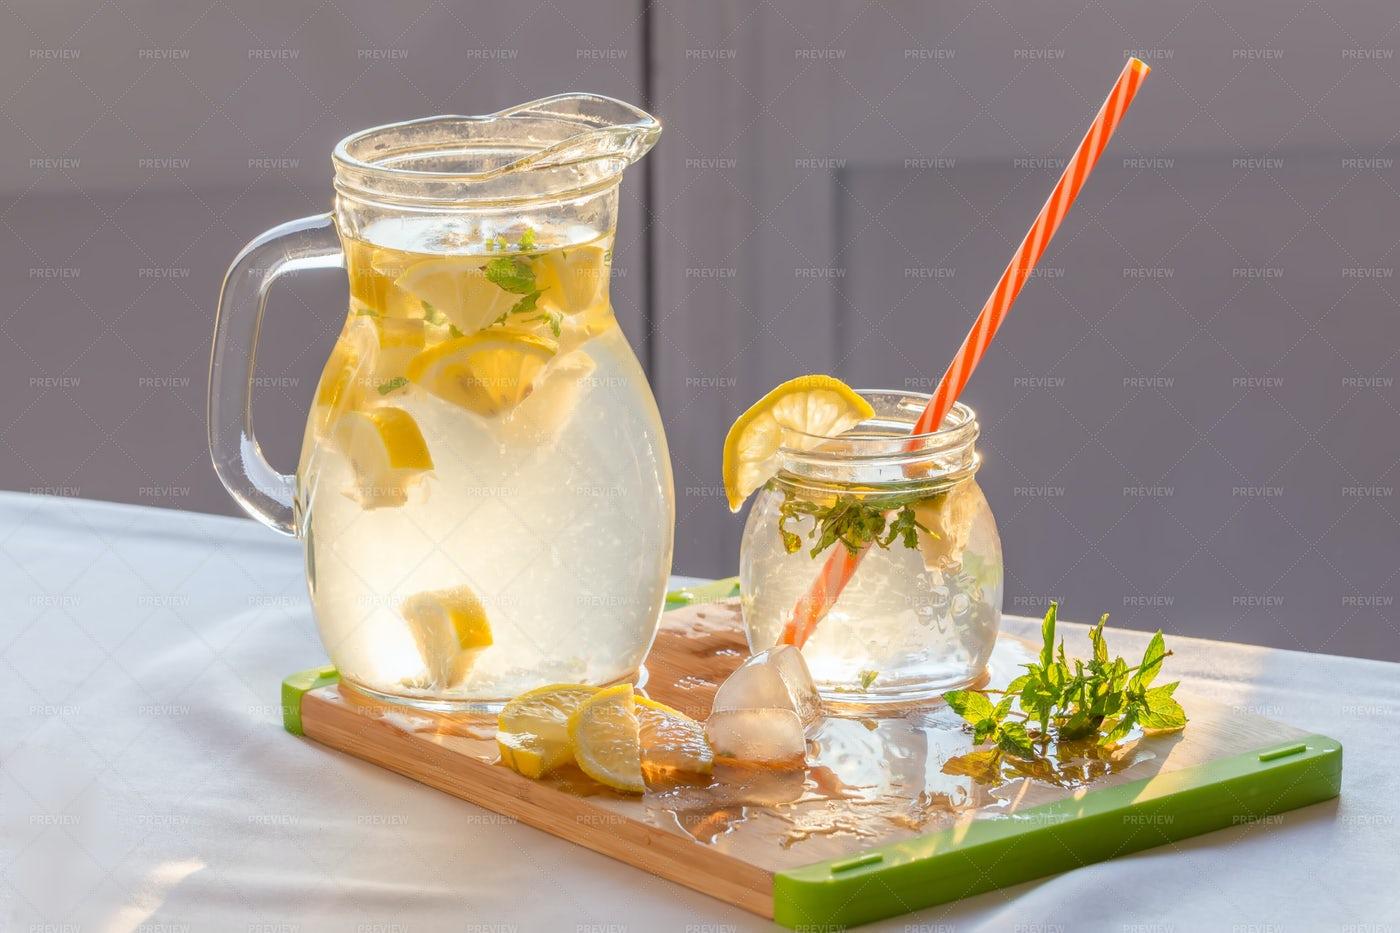 Homemade Lemonade With Mint: Stock Photos